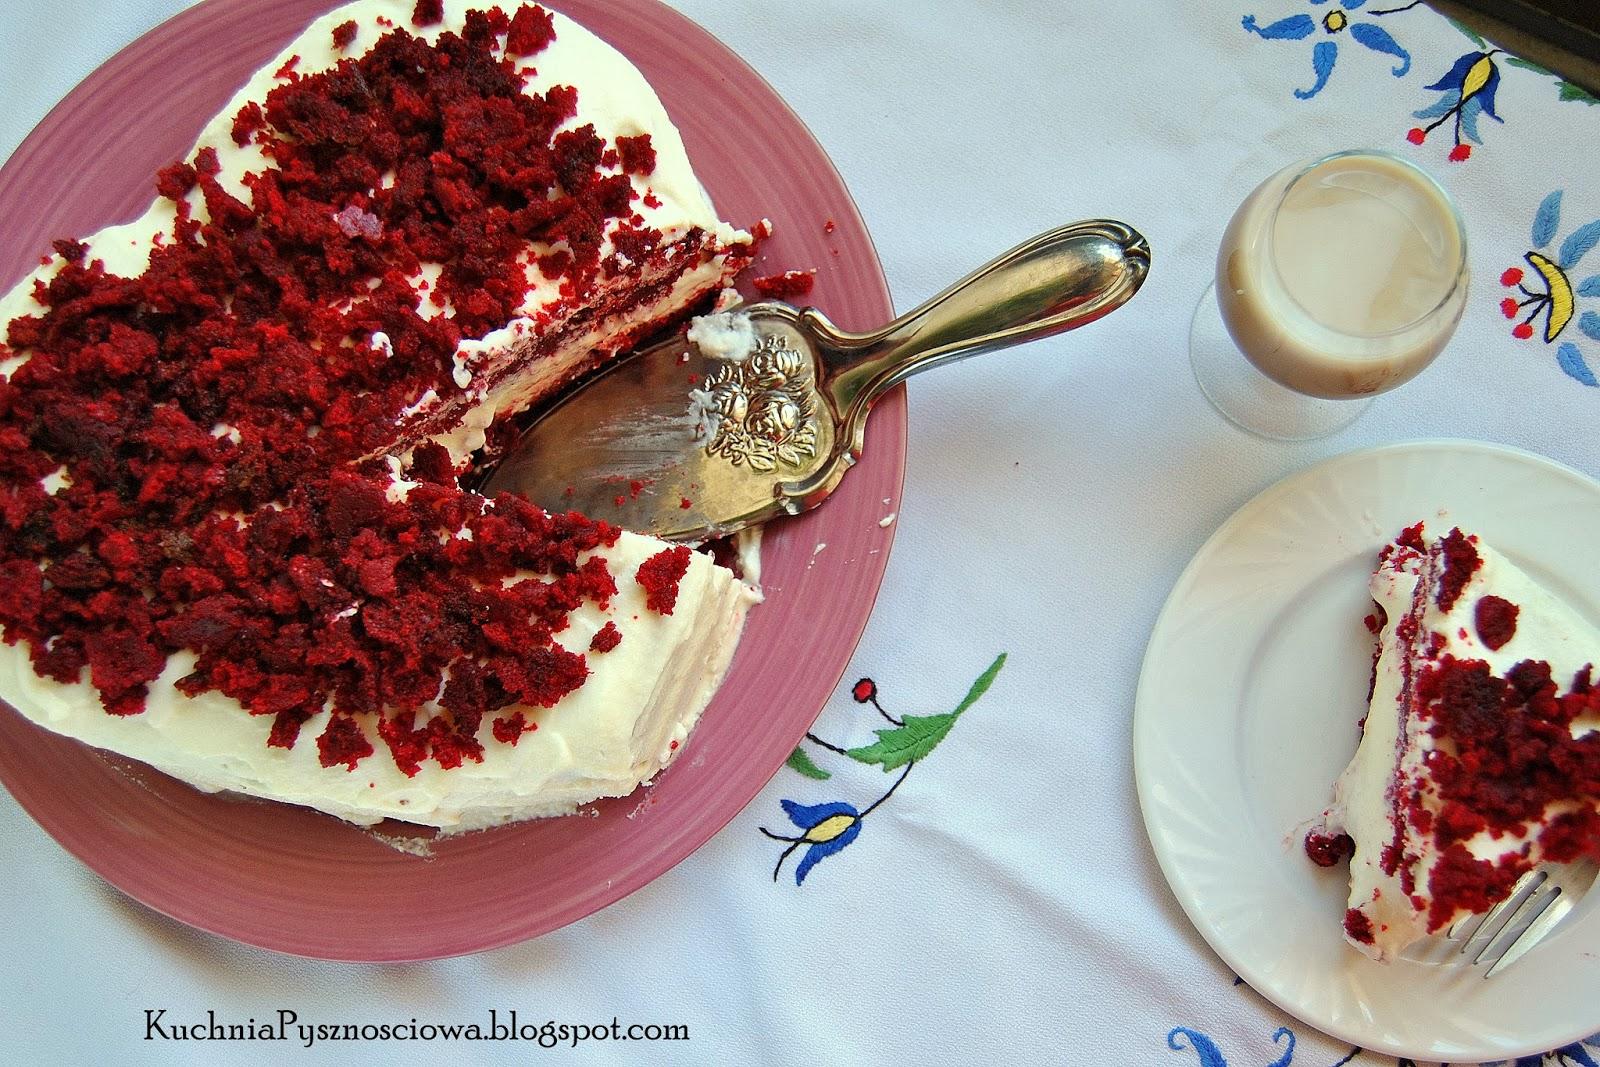 187. Red velvet cake, czyli słodka klasyka na Walentynki